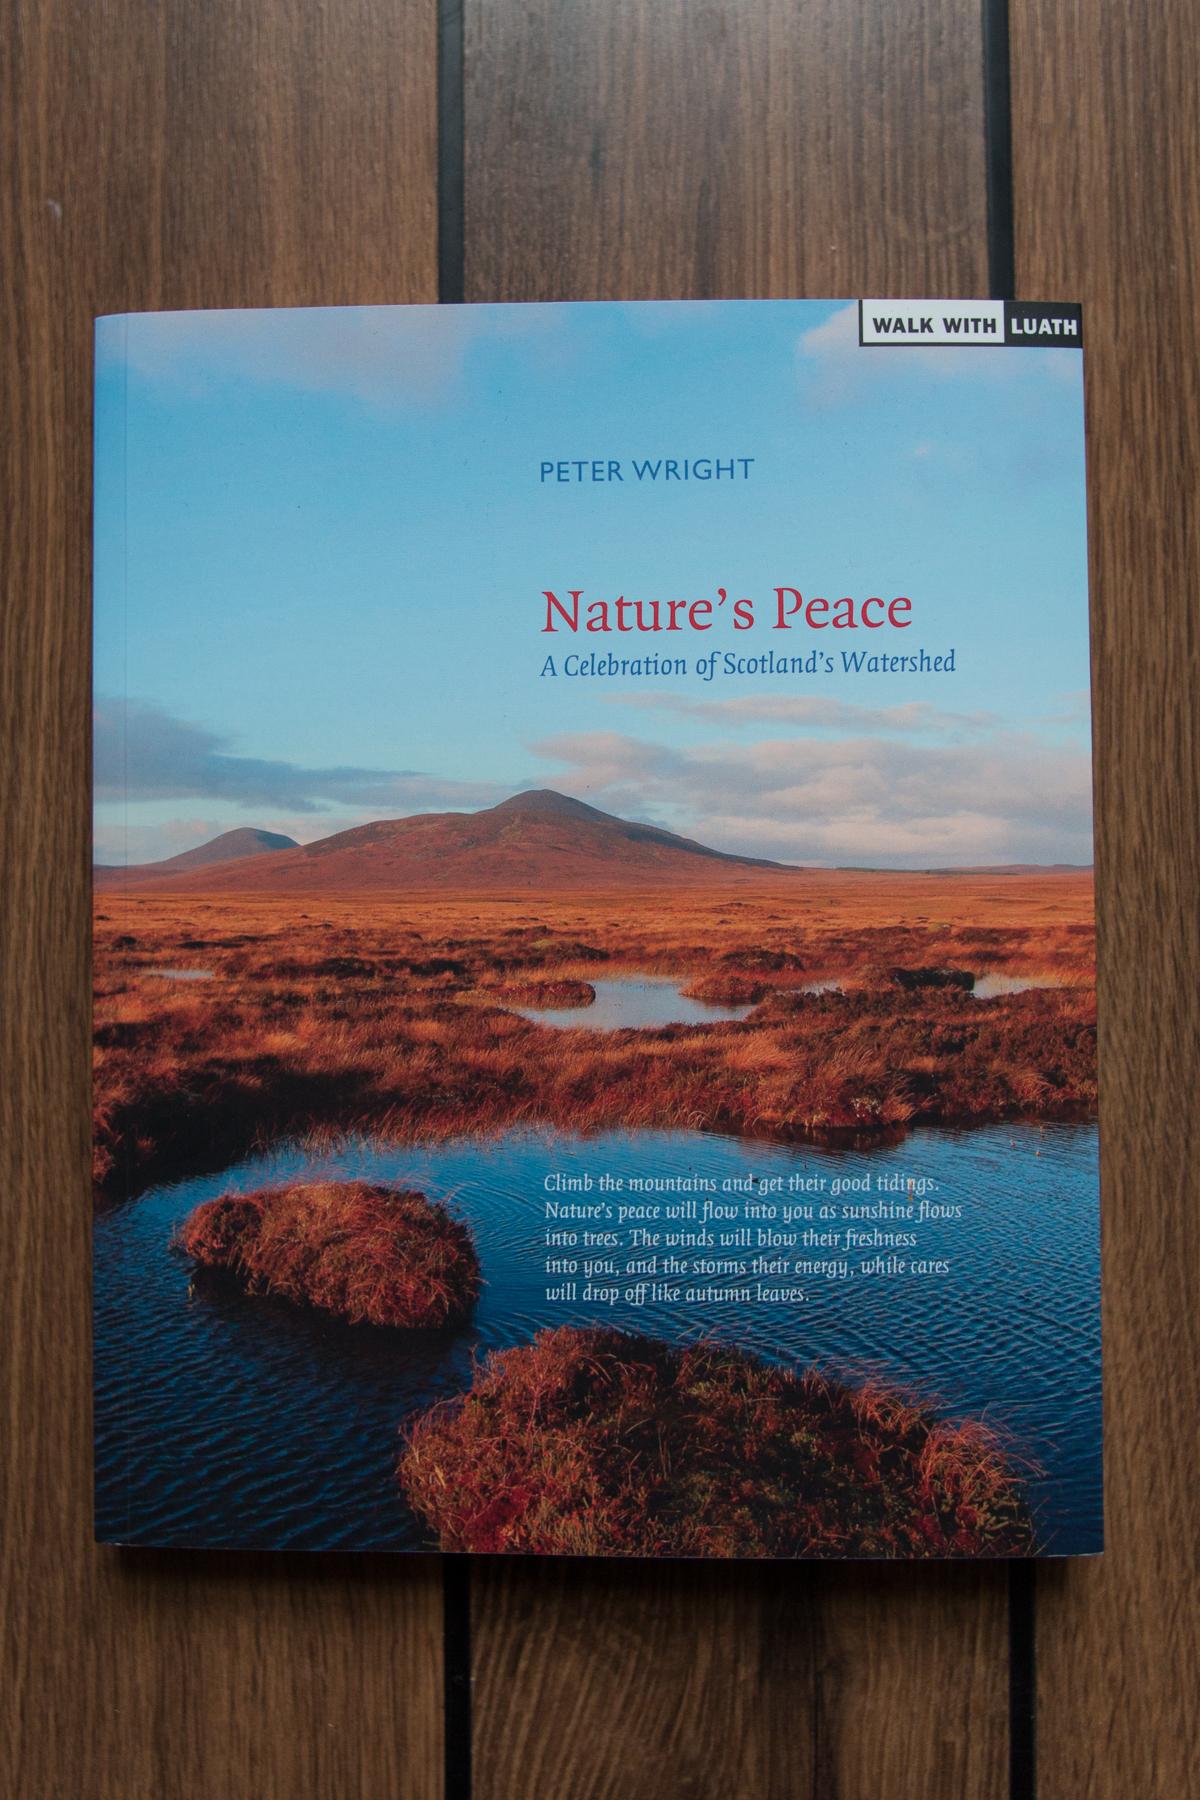 Nature's Peace (Luath): photos